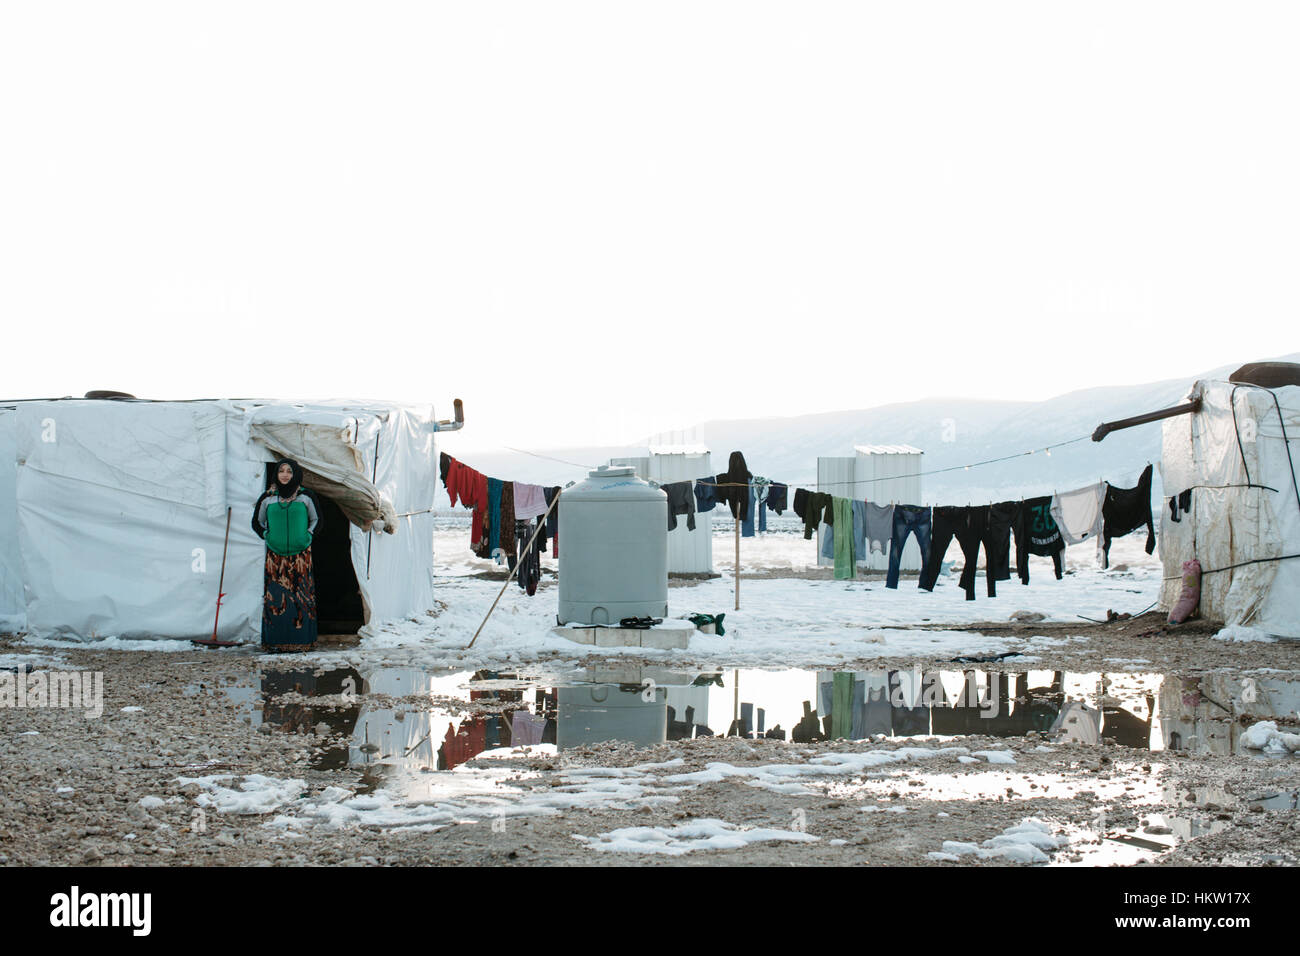 Fares, Lebanon. 29th Jan 2017. Migrants camp 99 at the valley of Beqaa in the border of Siria © Mattia Marinollii/Awakening/ - Stock Image